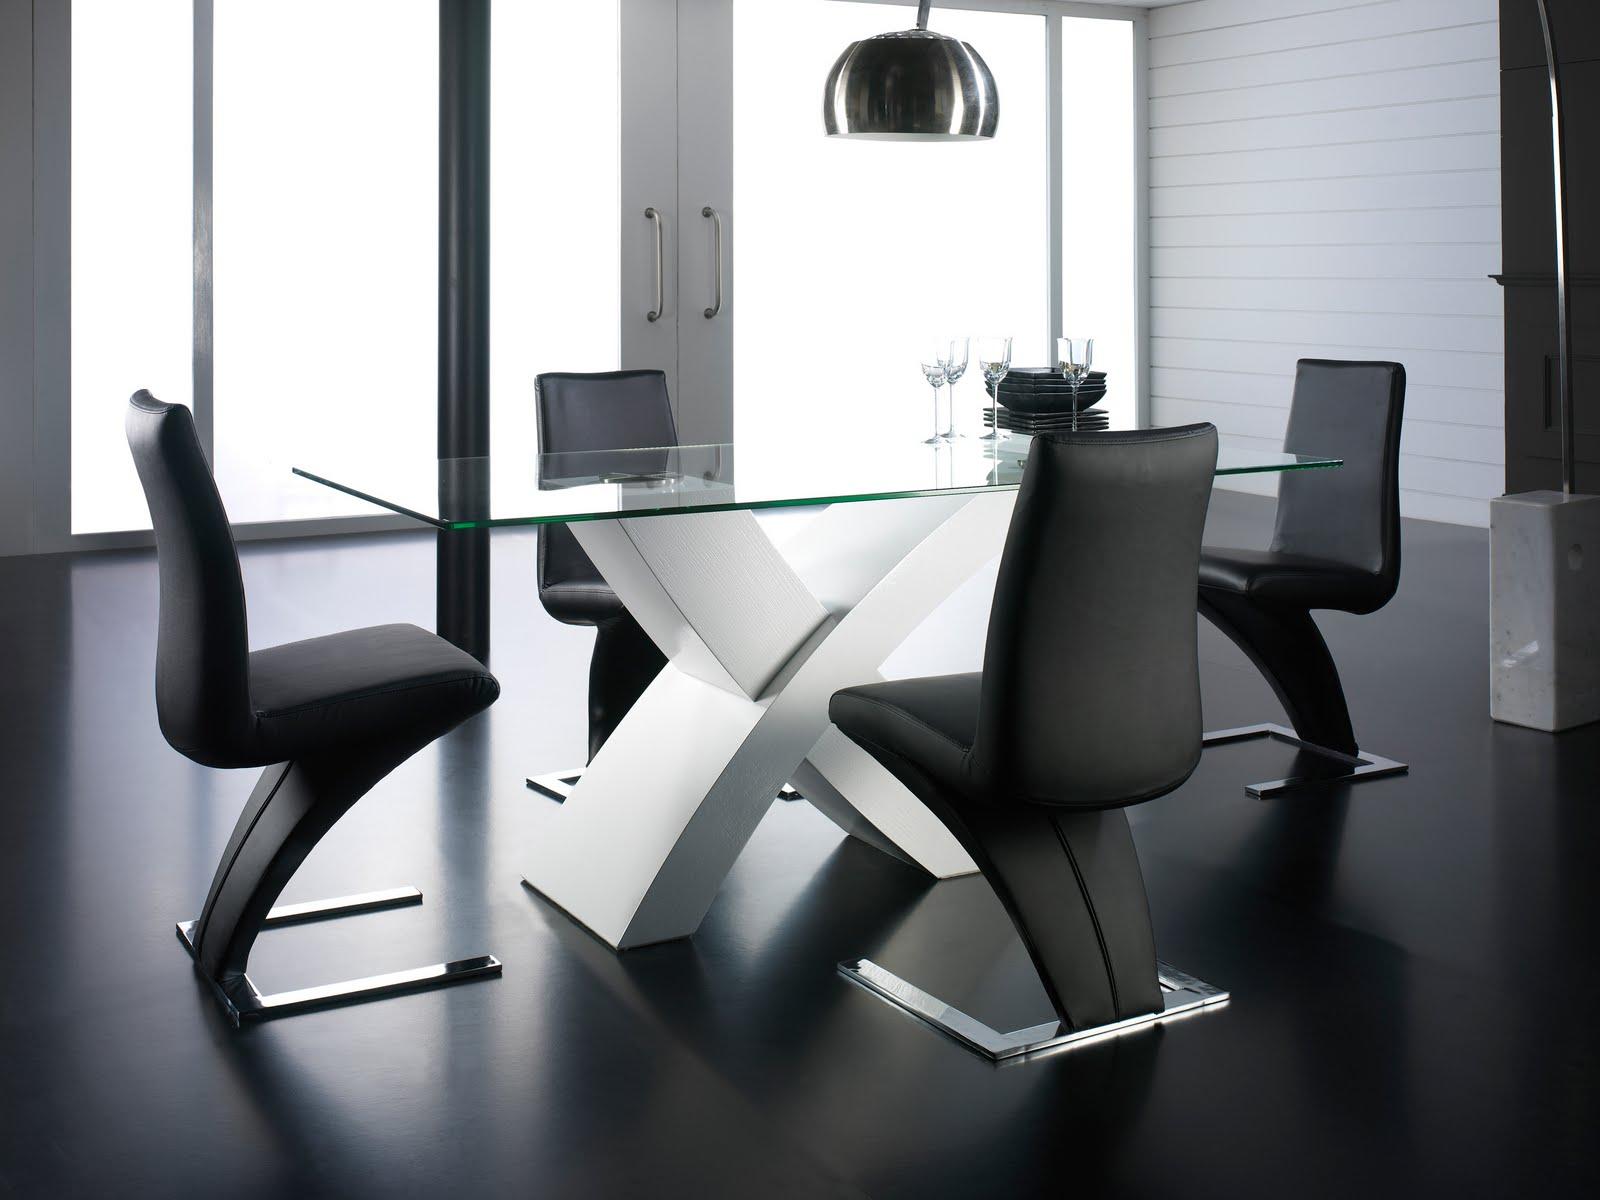 Muebles domingo bernal mesas y sillas for Muebles bernal